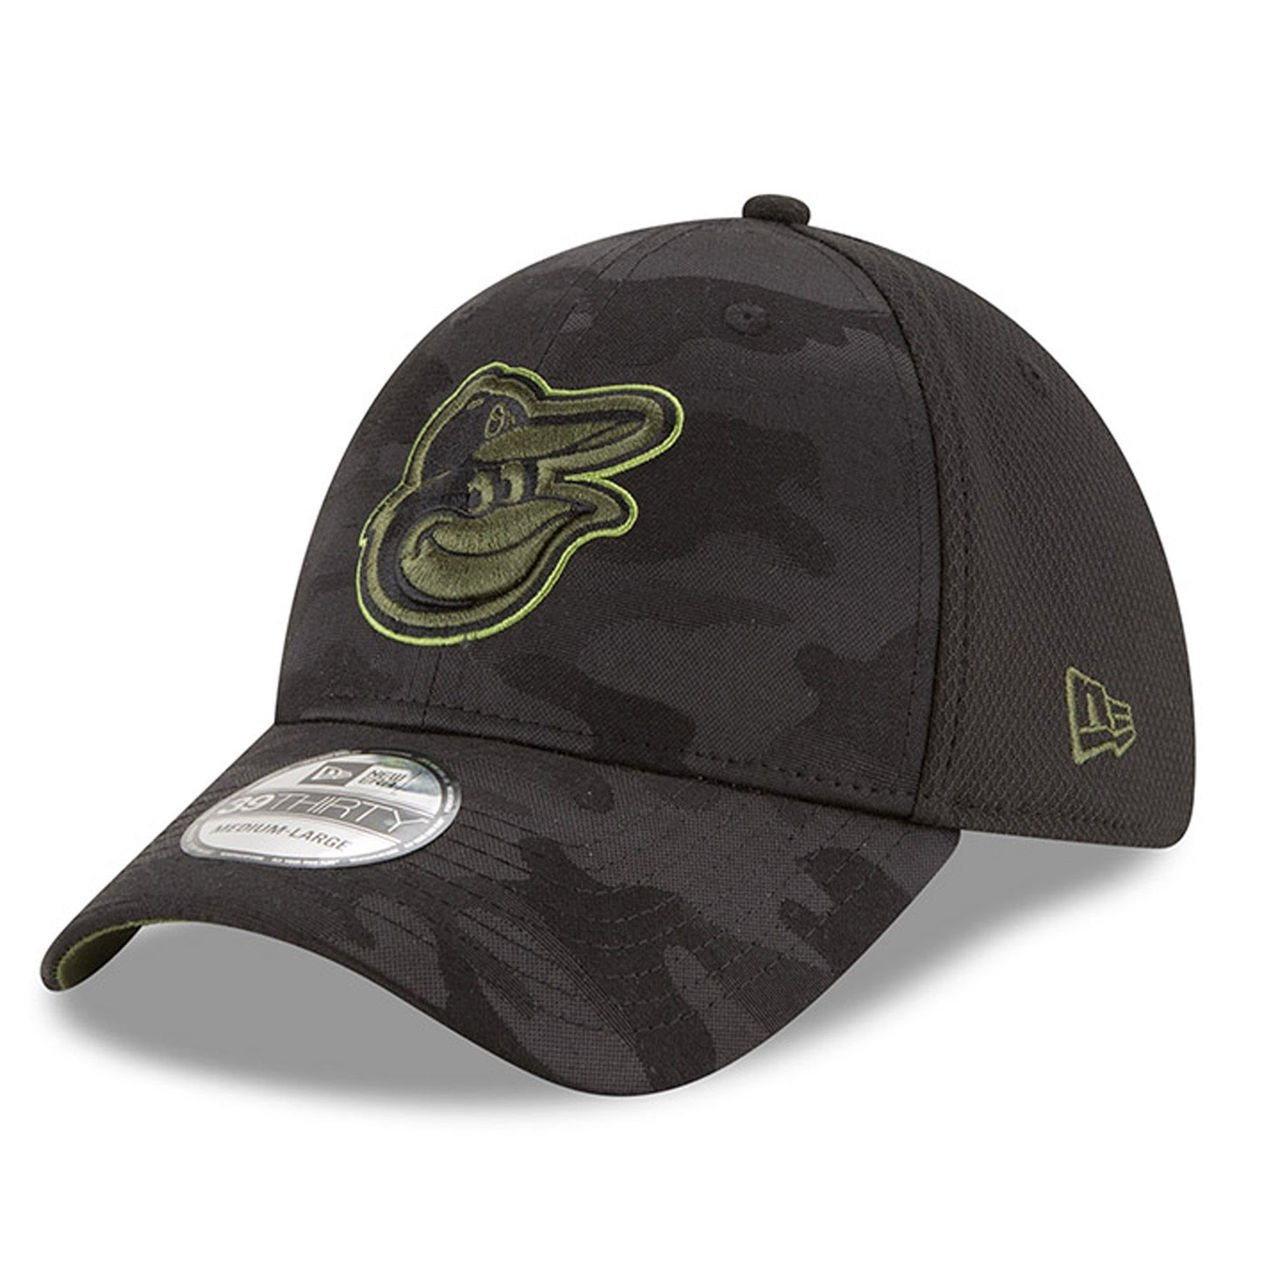 9d62ea800c255b Amazon.com : New Era Baltimore Orioles 2018 Memorial Day 39THIRTY Flex Hat  : Clothing